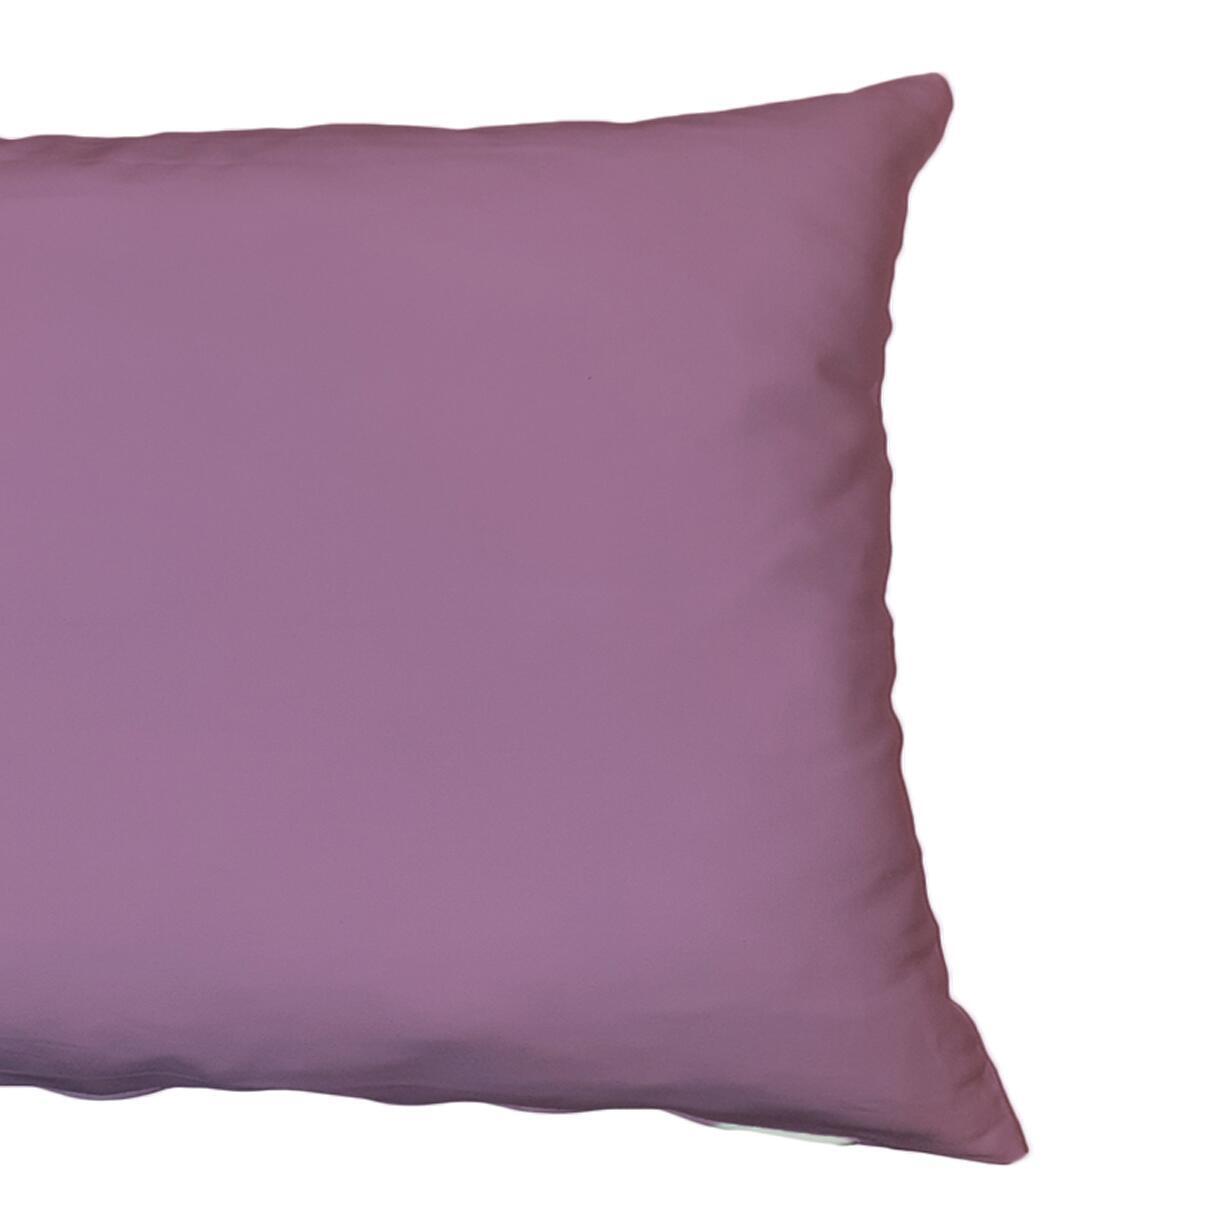 Cuscino Loneta lilla 40x60 cm - 3